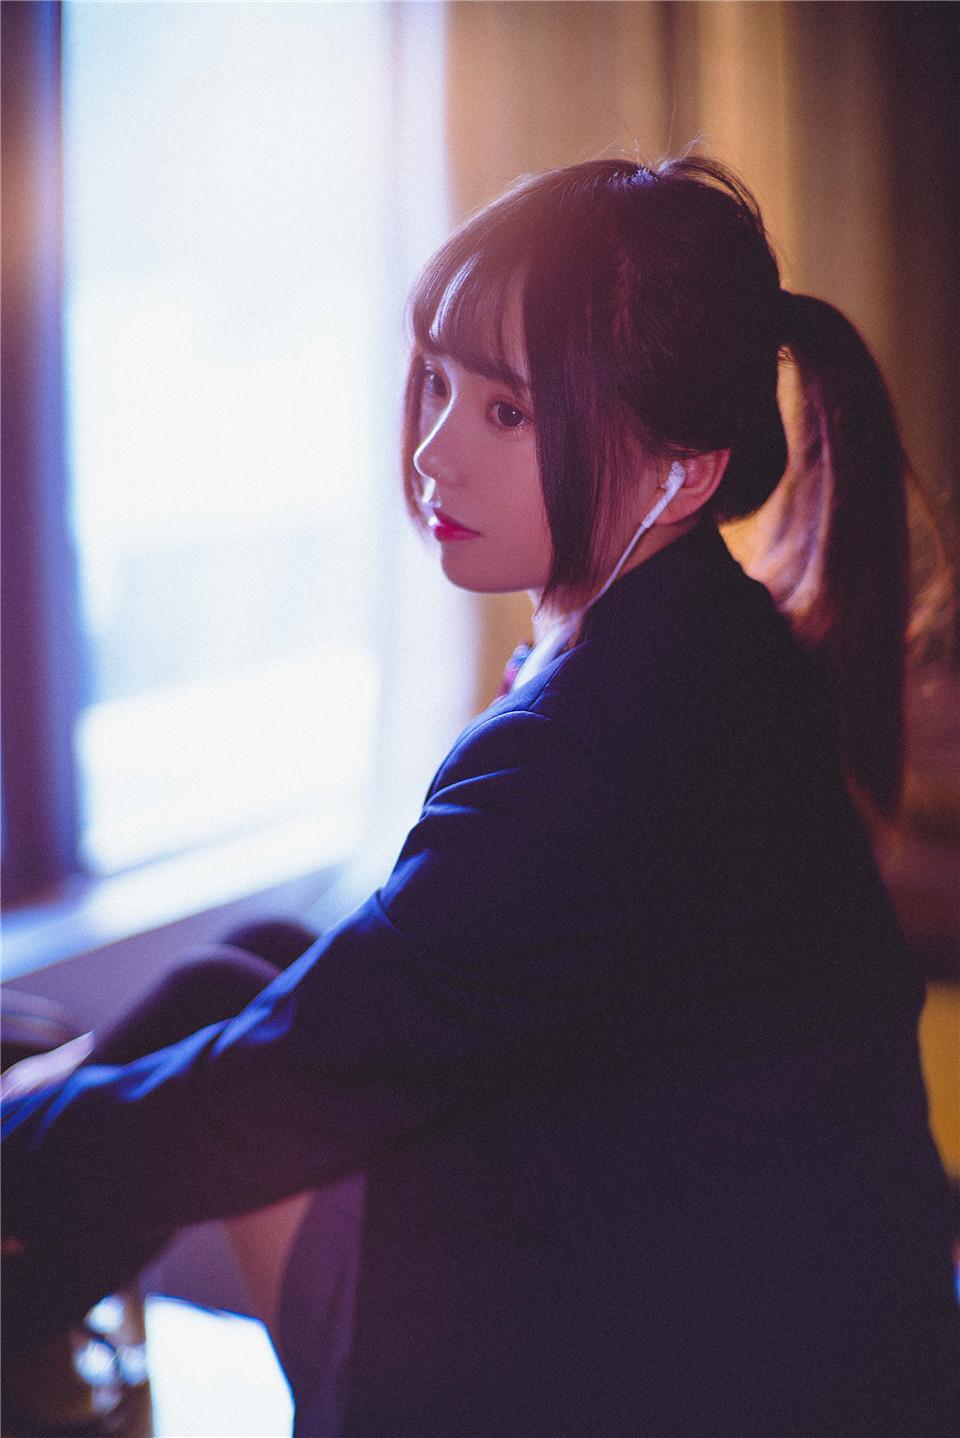 小野妹子w –  冬装JK [17][59MB]